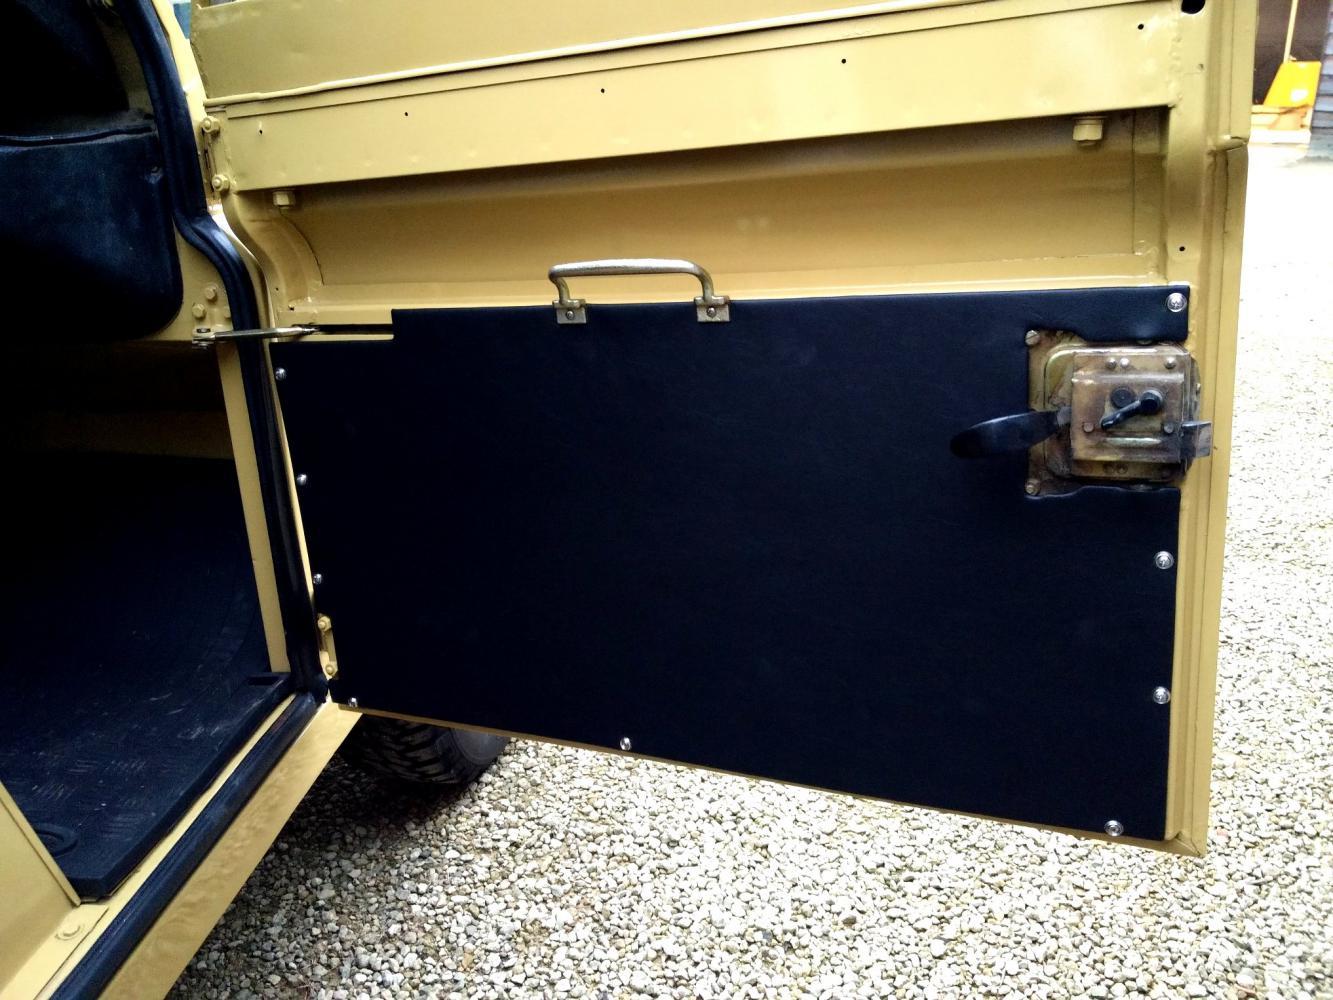 Click image for larger version  Name:1978 LR LHD Santana 88 Hardtop A Mustard Yellow new front door trims.jpg Views:147 Size:178.5 KB ID:289929